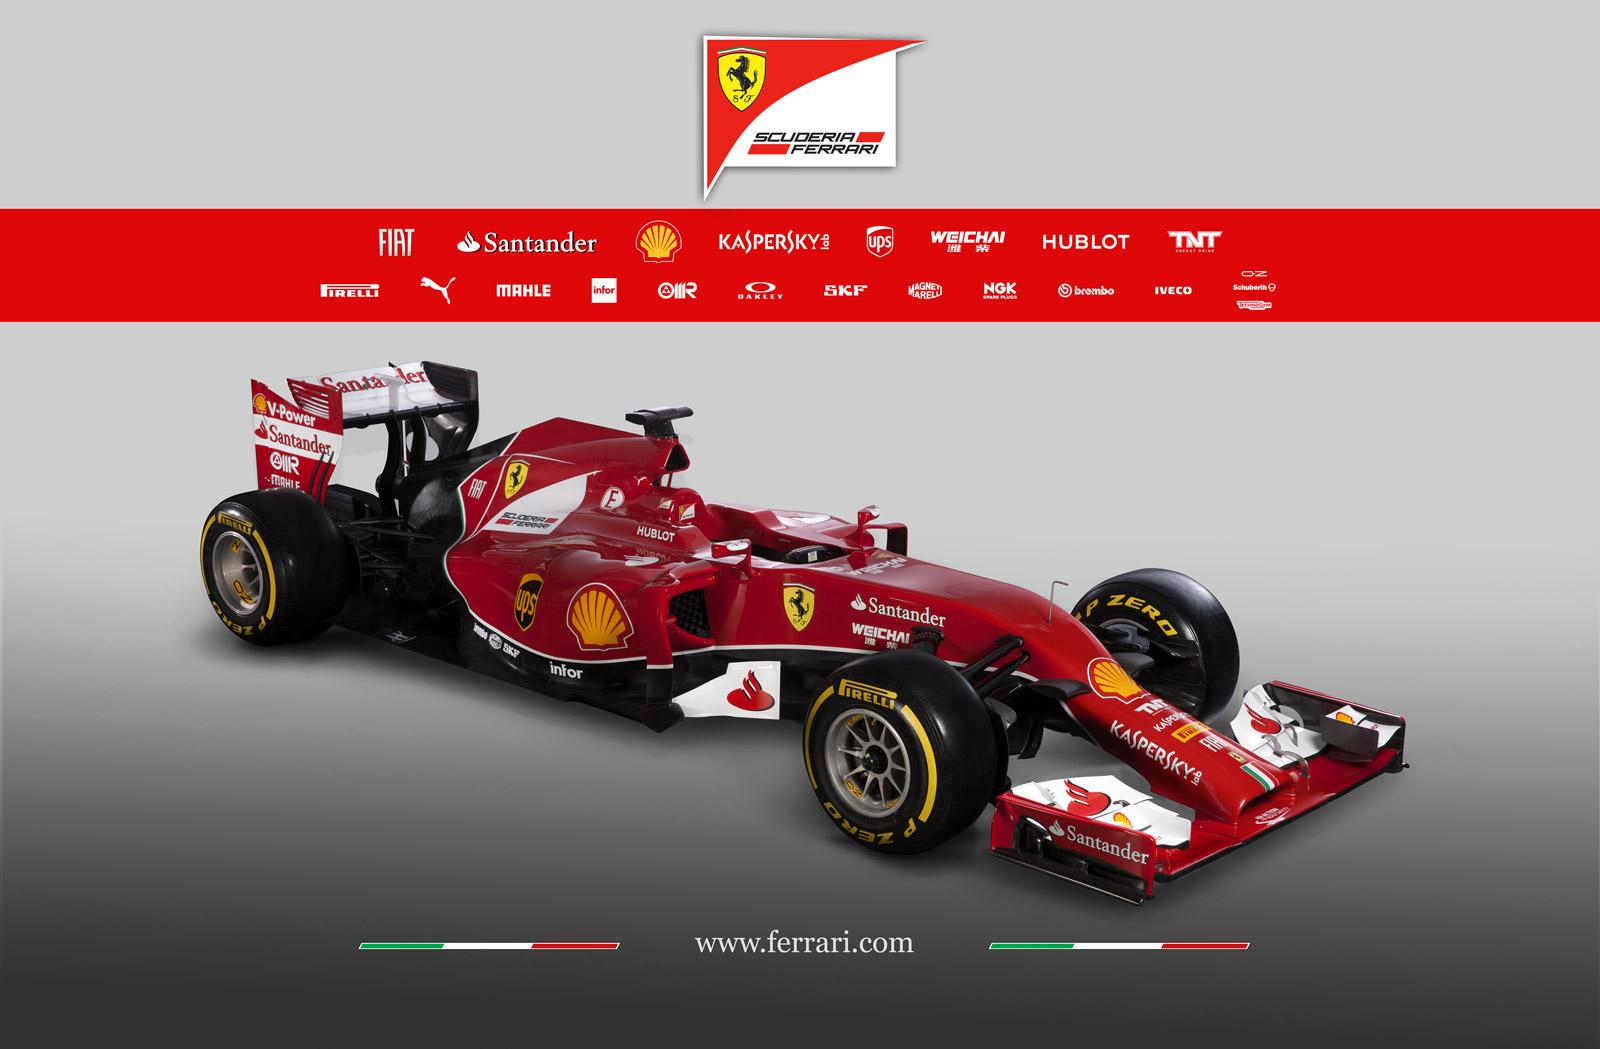 Ferrari Reveals Its F14 T 2014 Formula One Car: Video